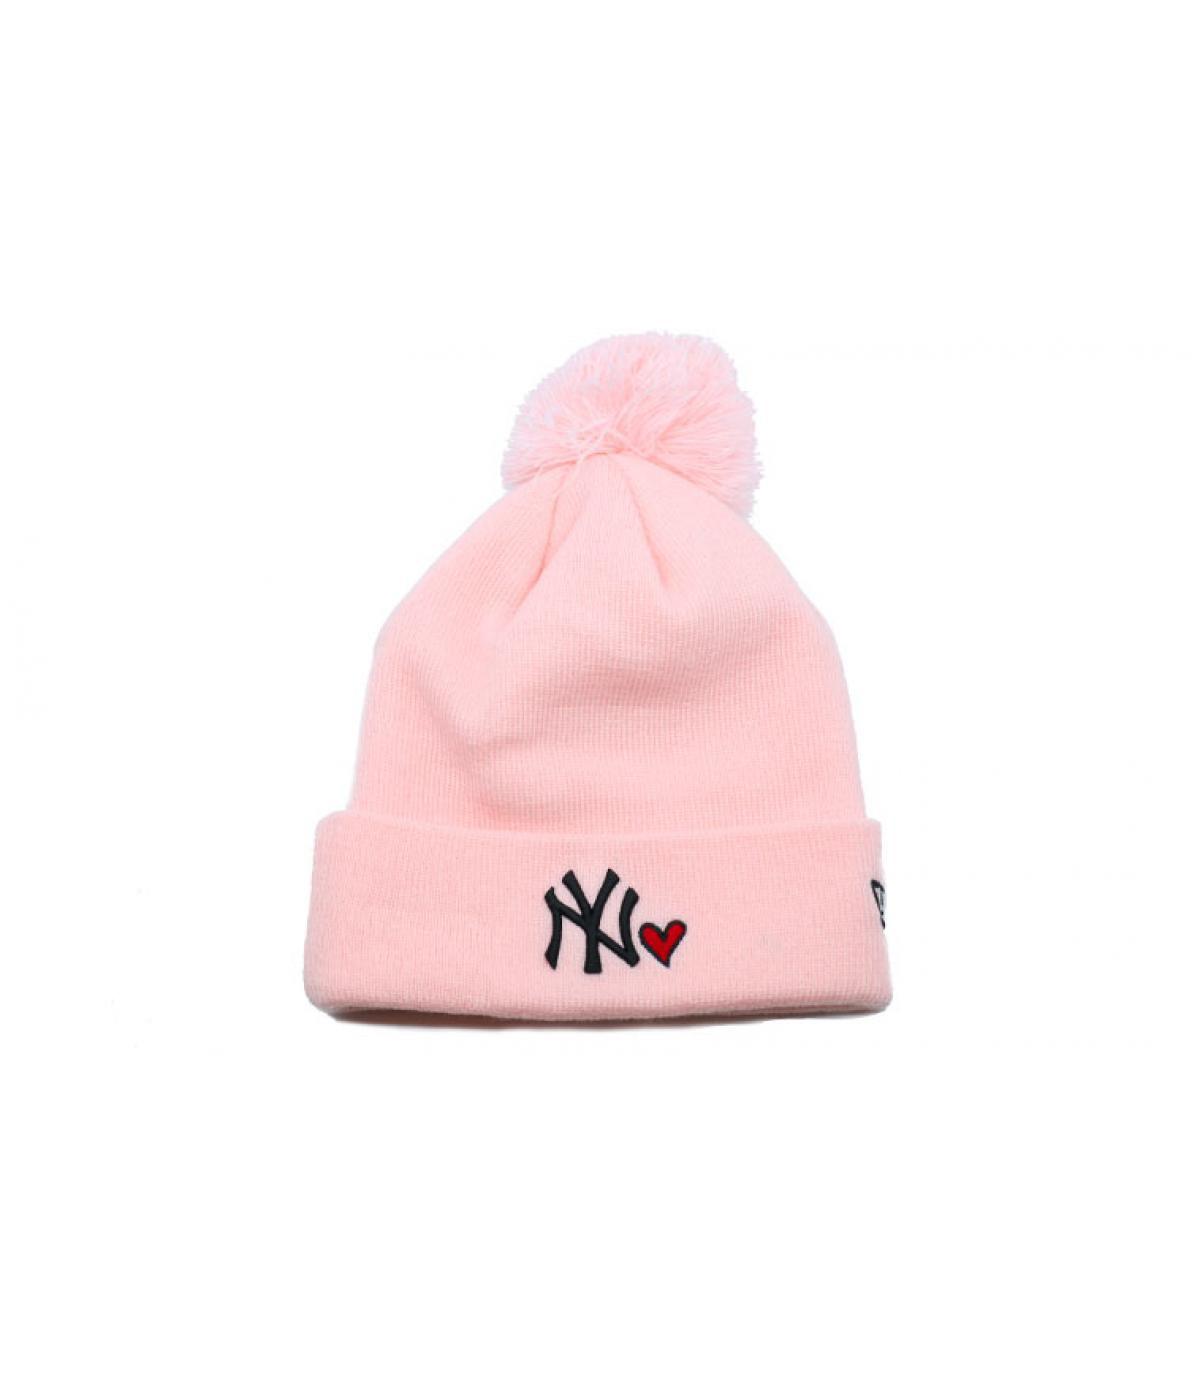 667bb29cc629c bonnet NY cœur rose - Bonnet Wmns Heart NY knit pink par New Era ...